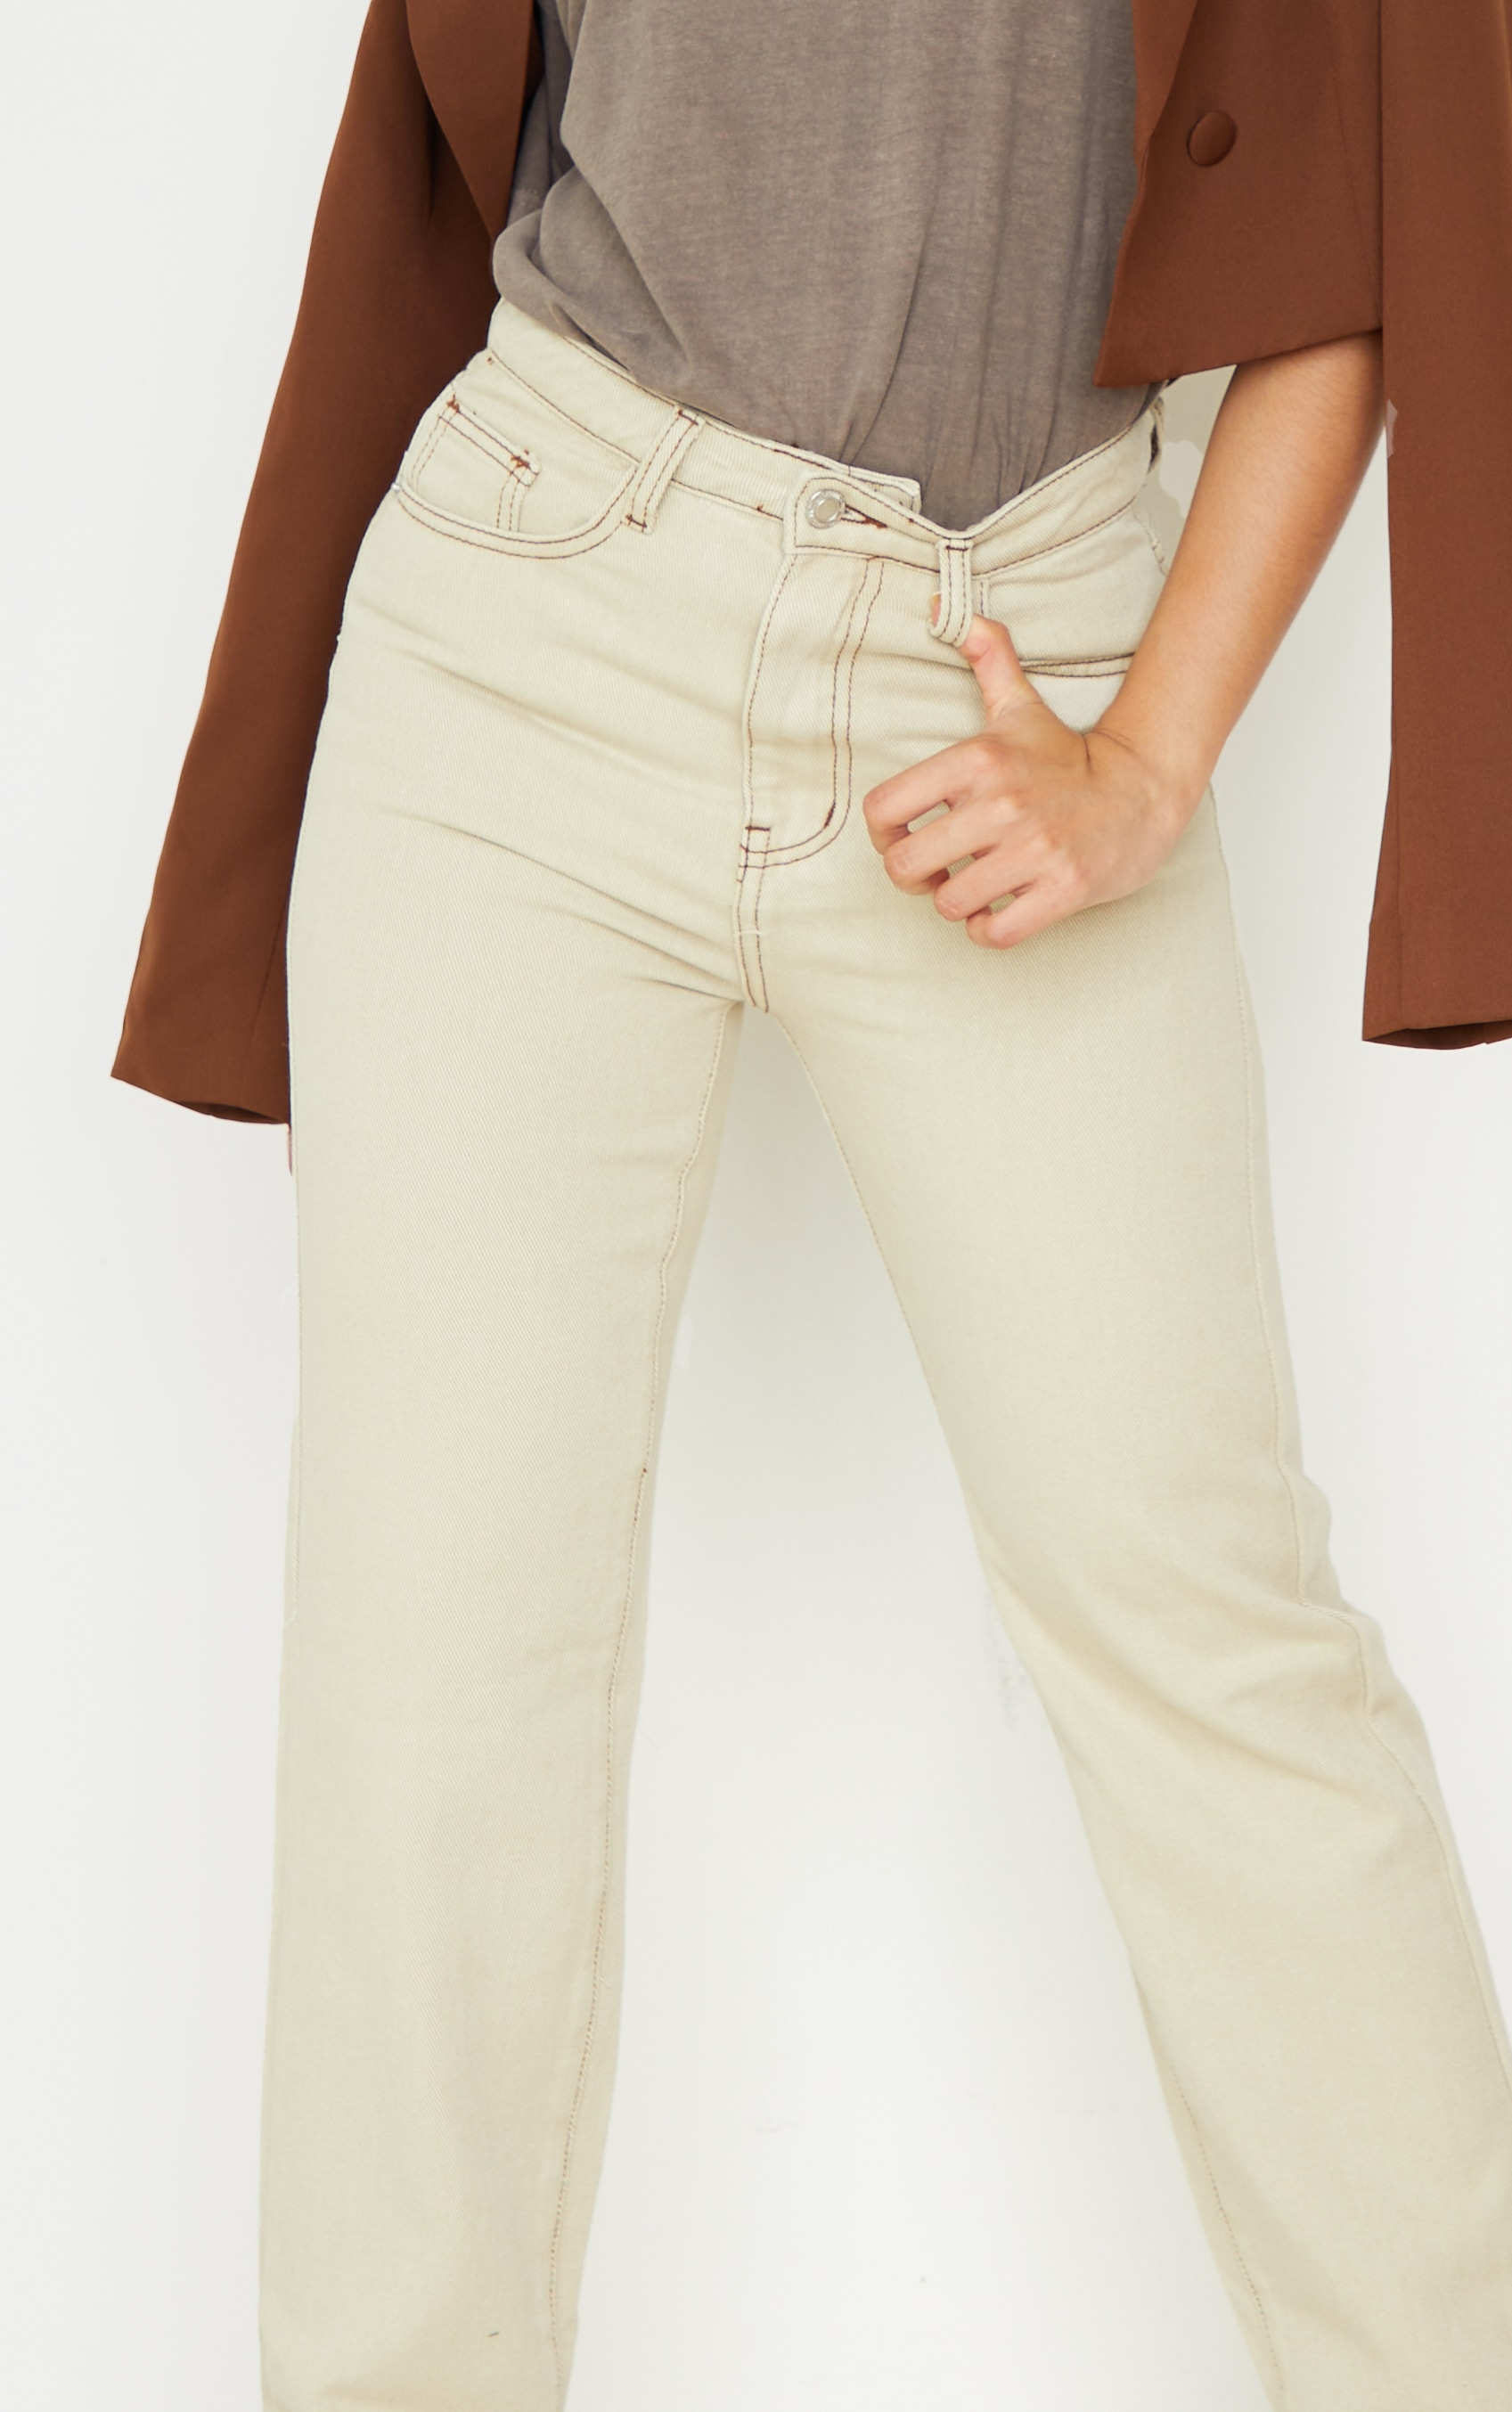 Petite Stone Contrast Stitch Long Leg Straight Jeans 4